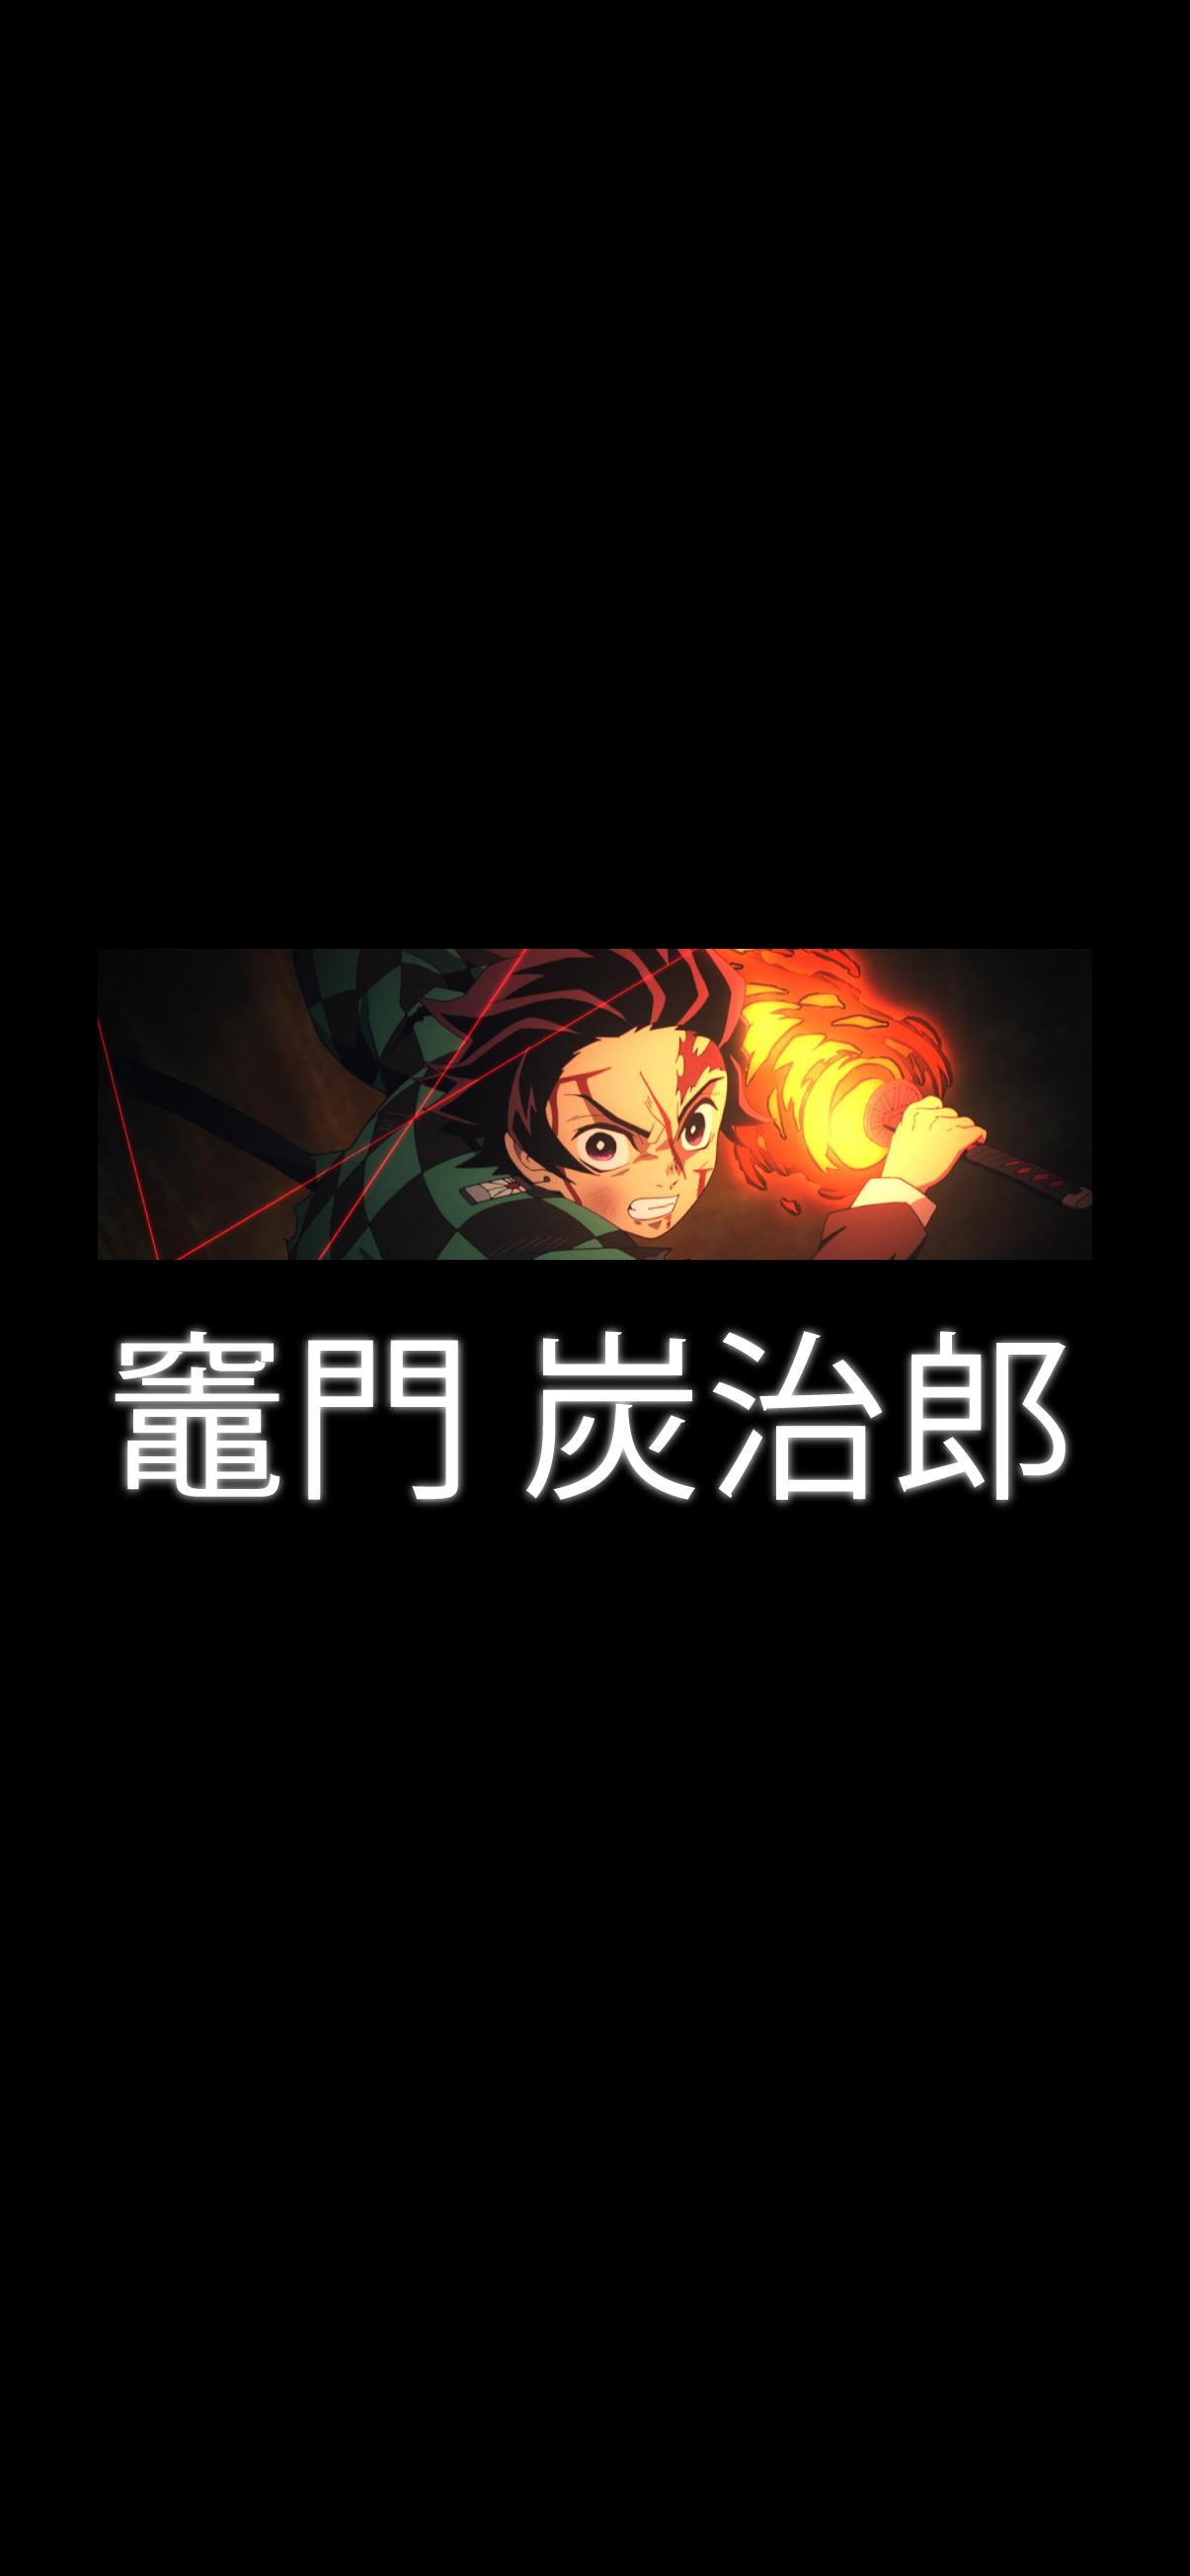 Demon Slayer Wallpaper Amoled - 竈門 炭治郎 (Tanjiro Kamado)